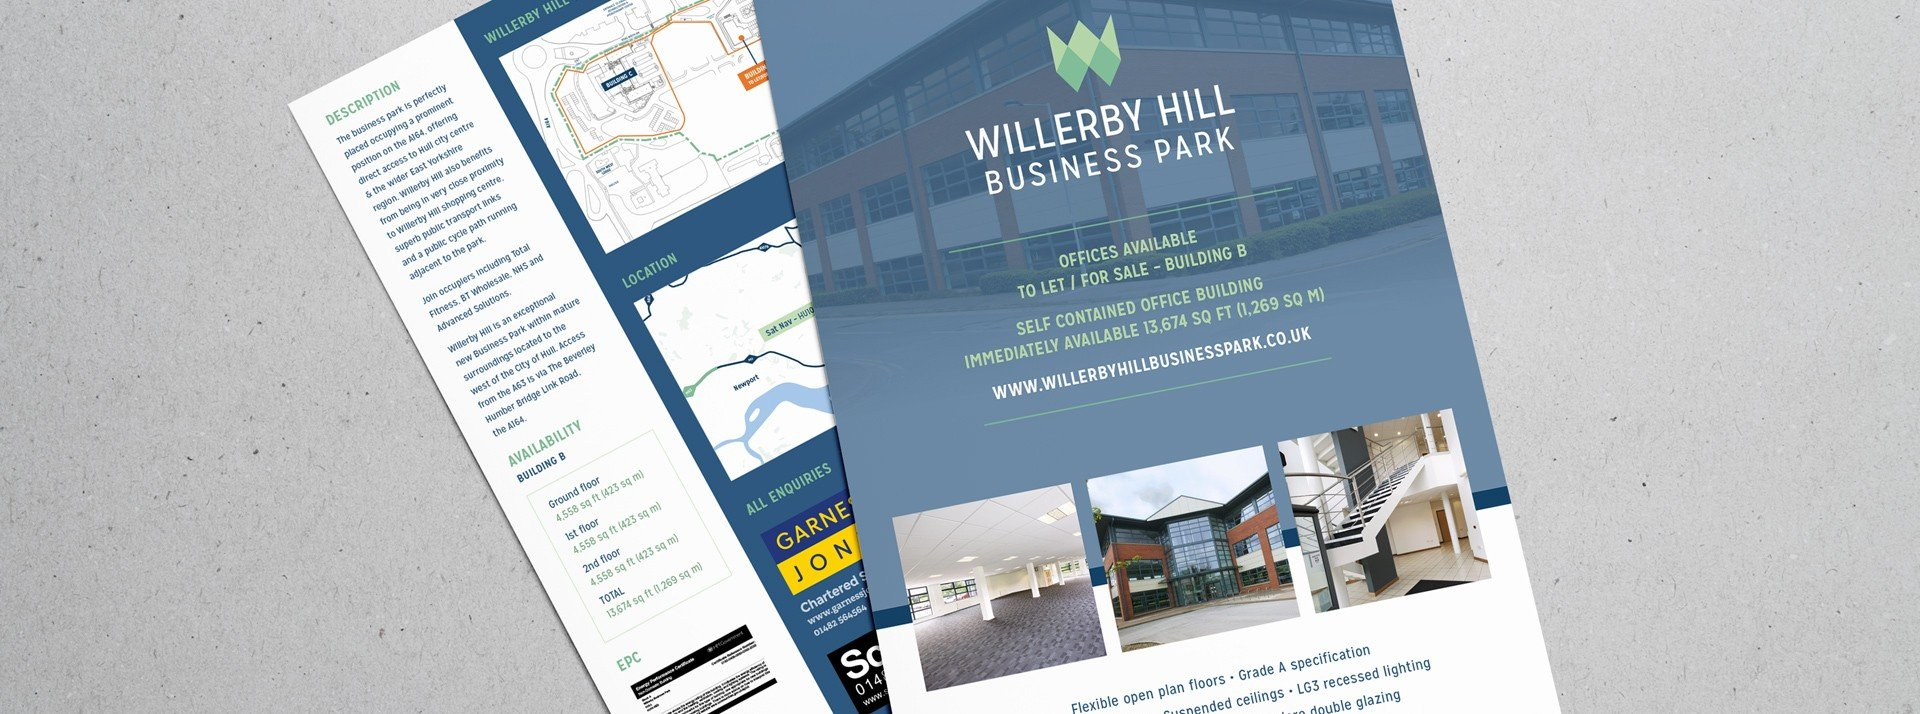 WillberyHillProject